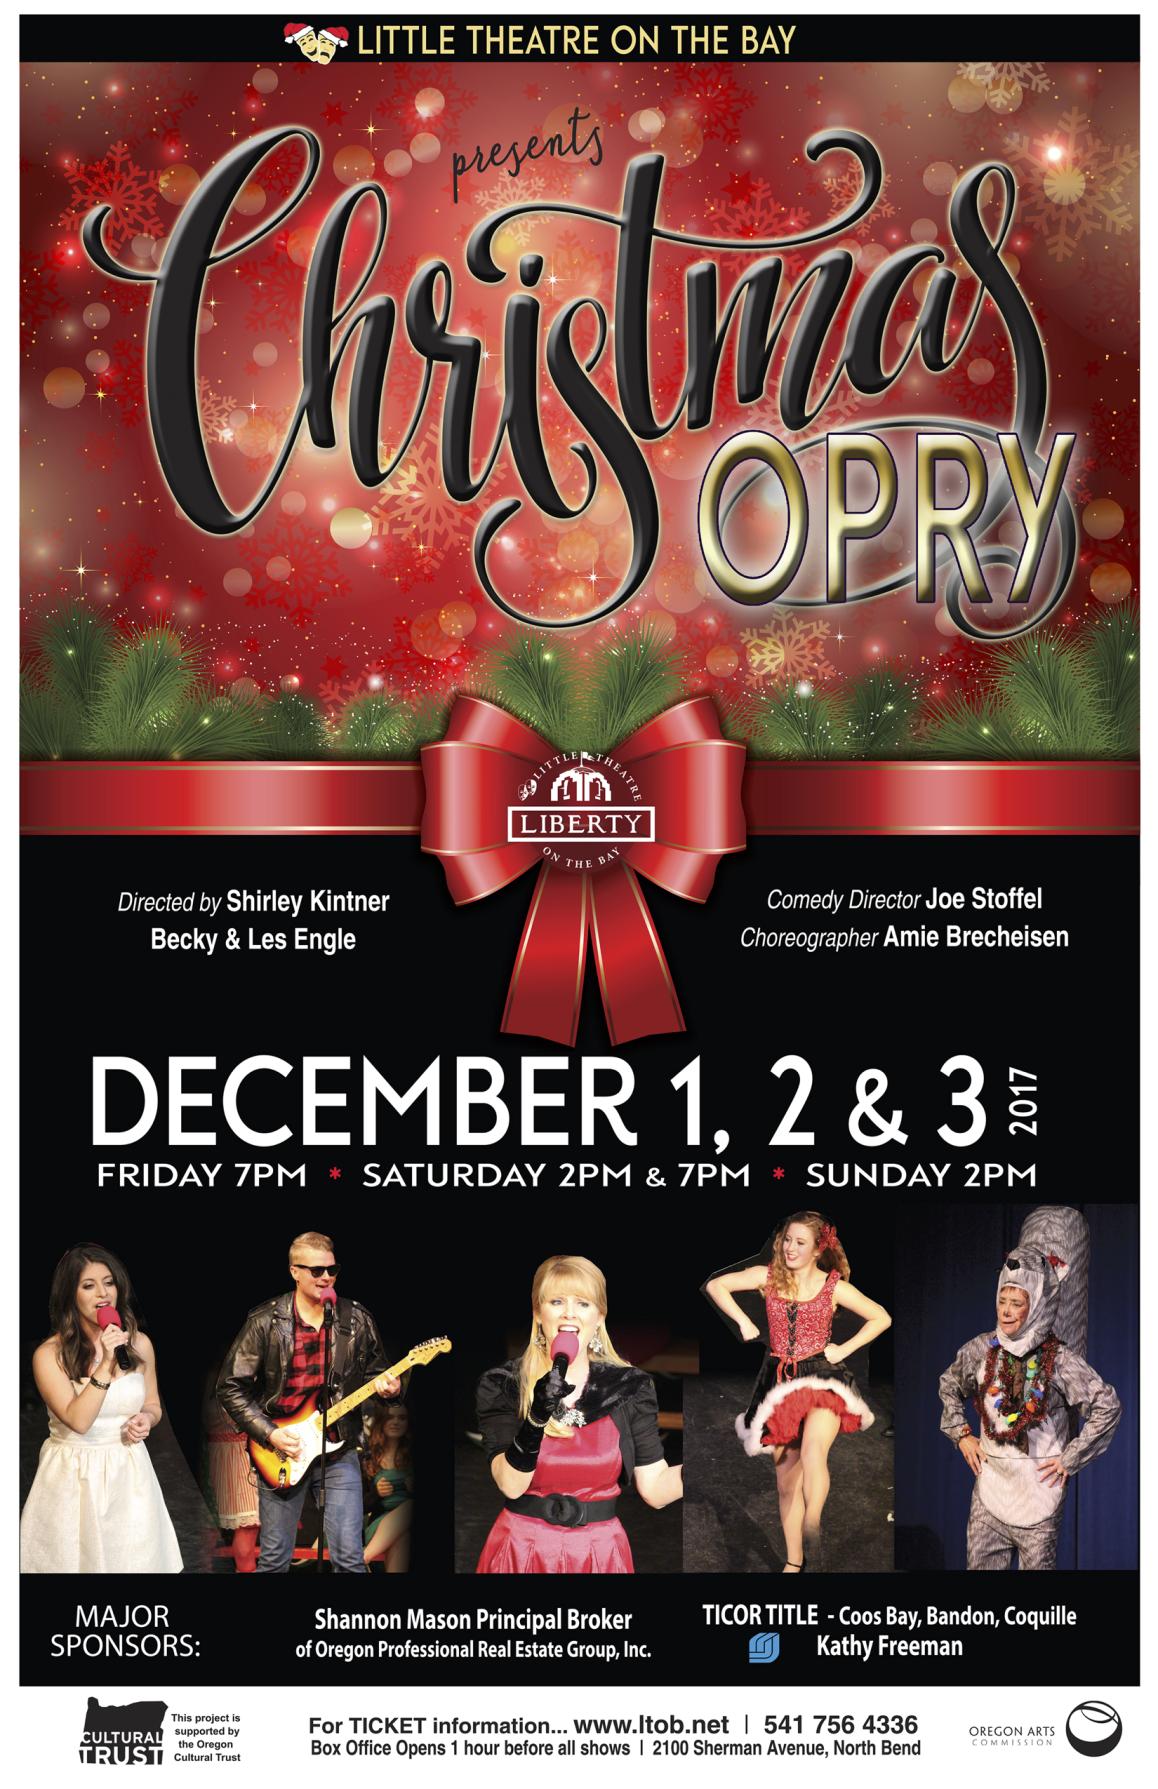 LTOB's Christmas Opry